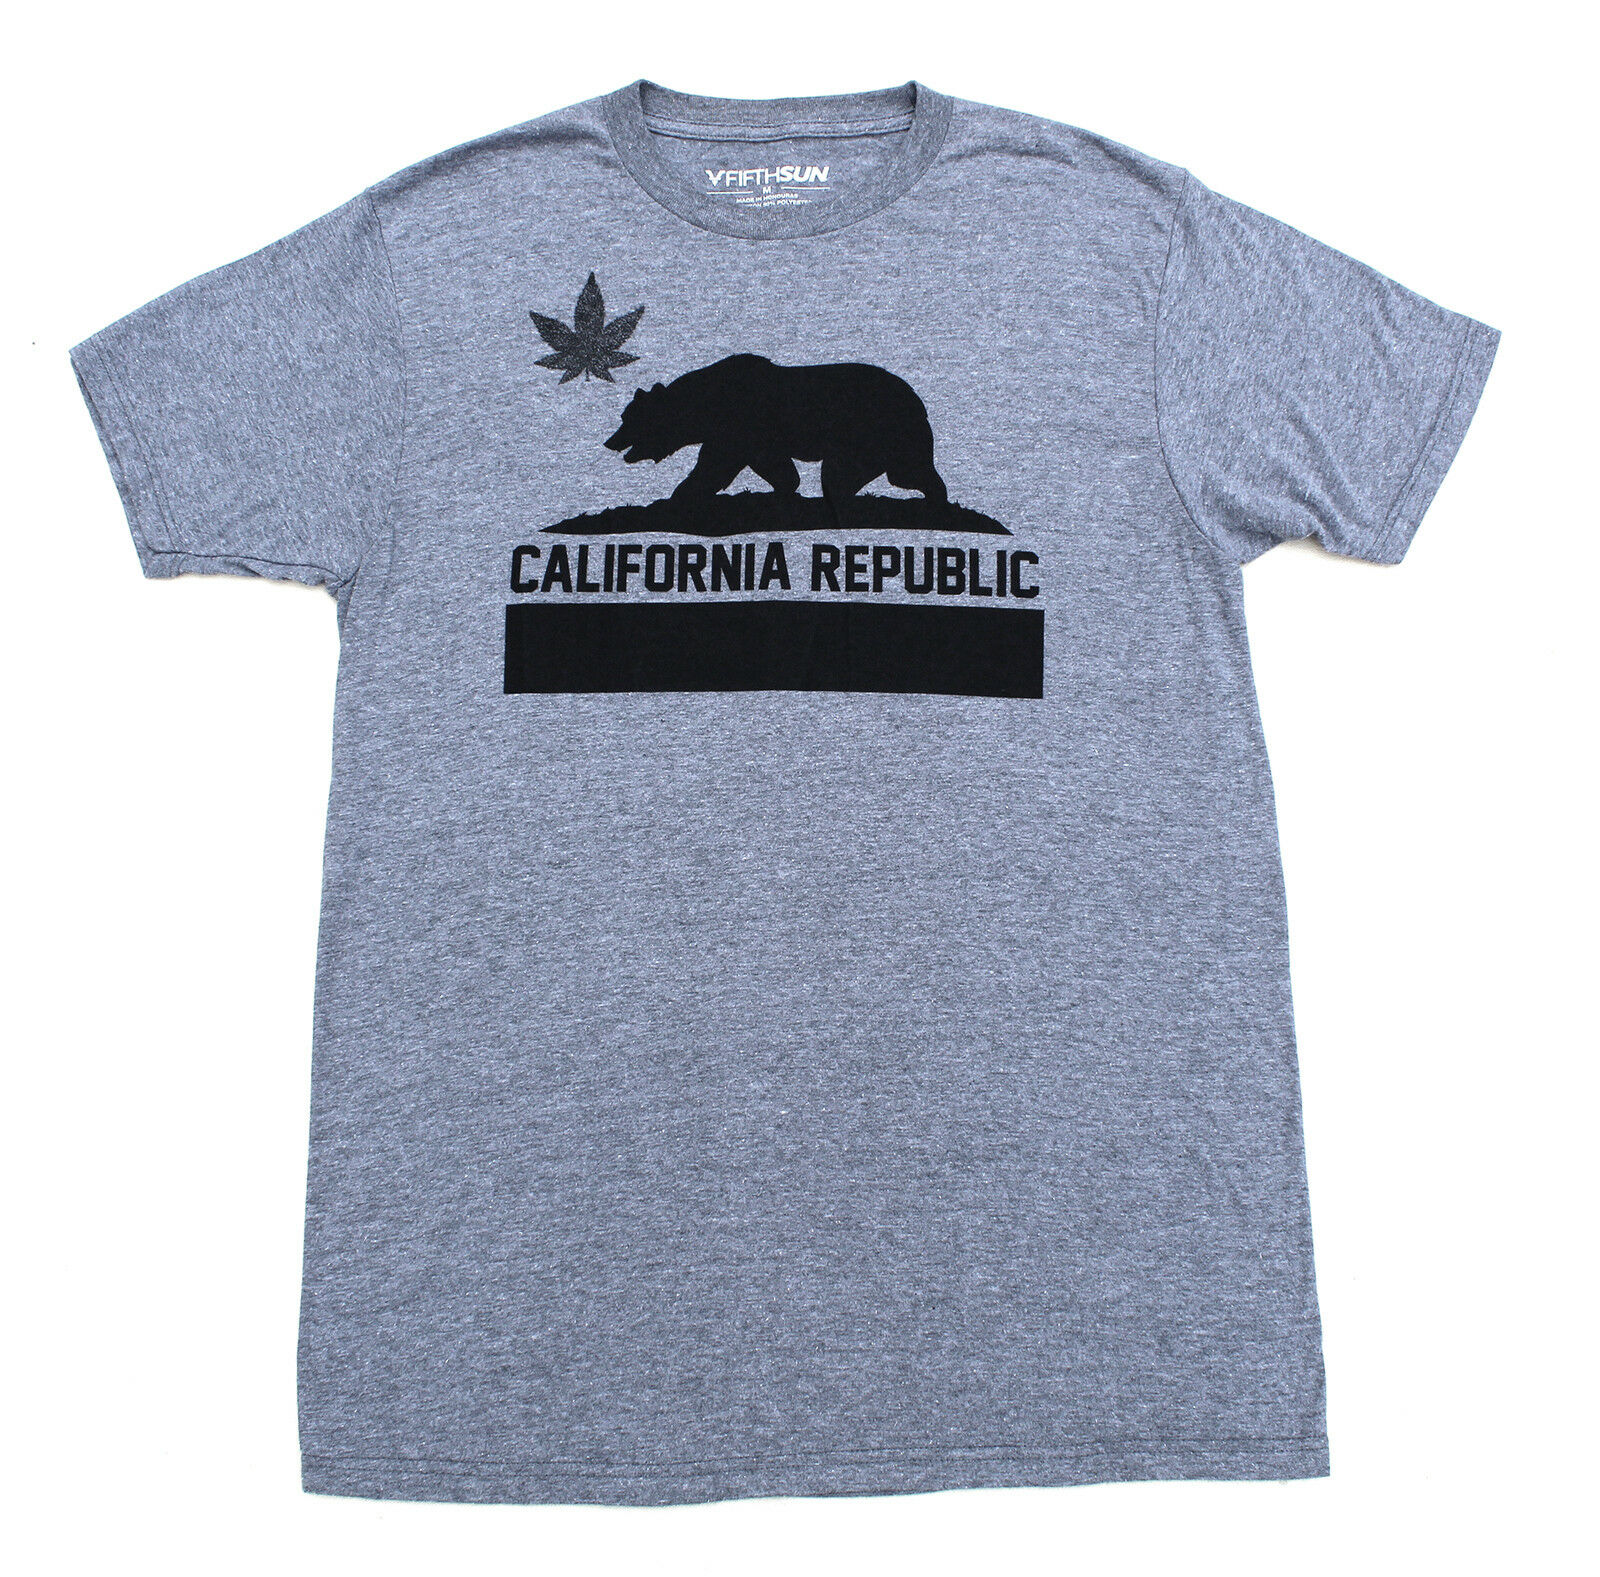 FIFTH SUN Tee Cotton T-Shirt Marijuana California Republic Street Style 420 Mens